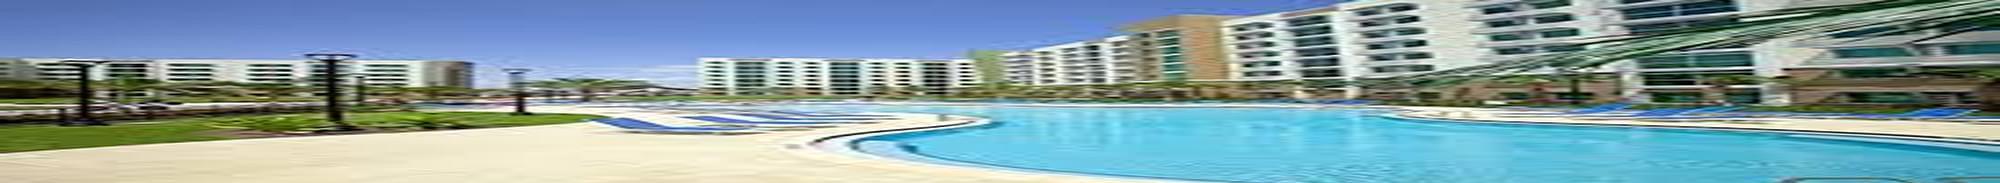 Florida Atlantic University Fau Boca Raton Admission Criteria Application Deadlines 2021